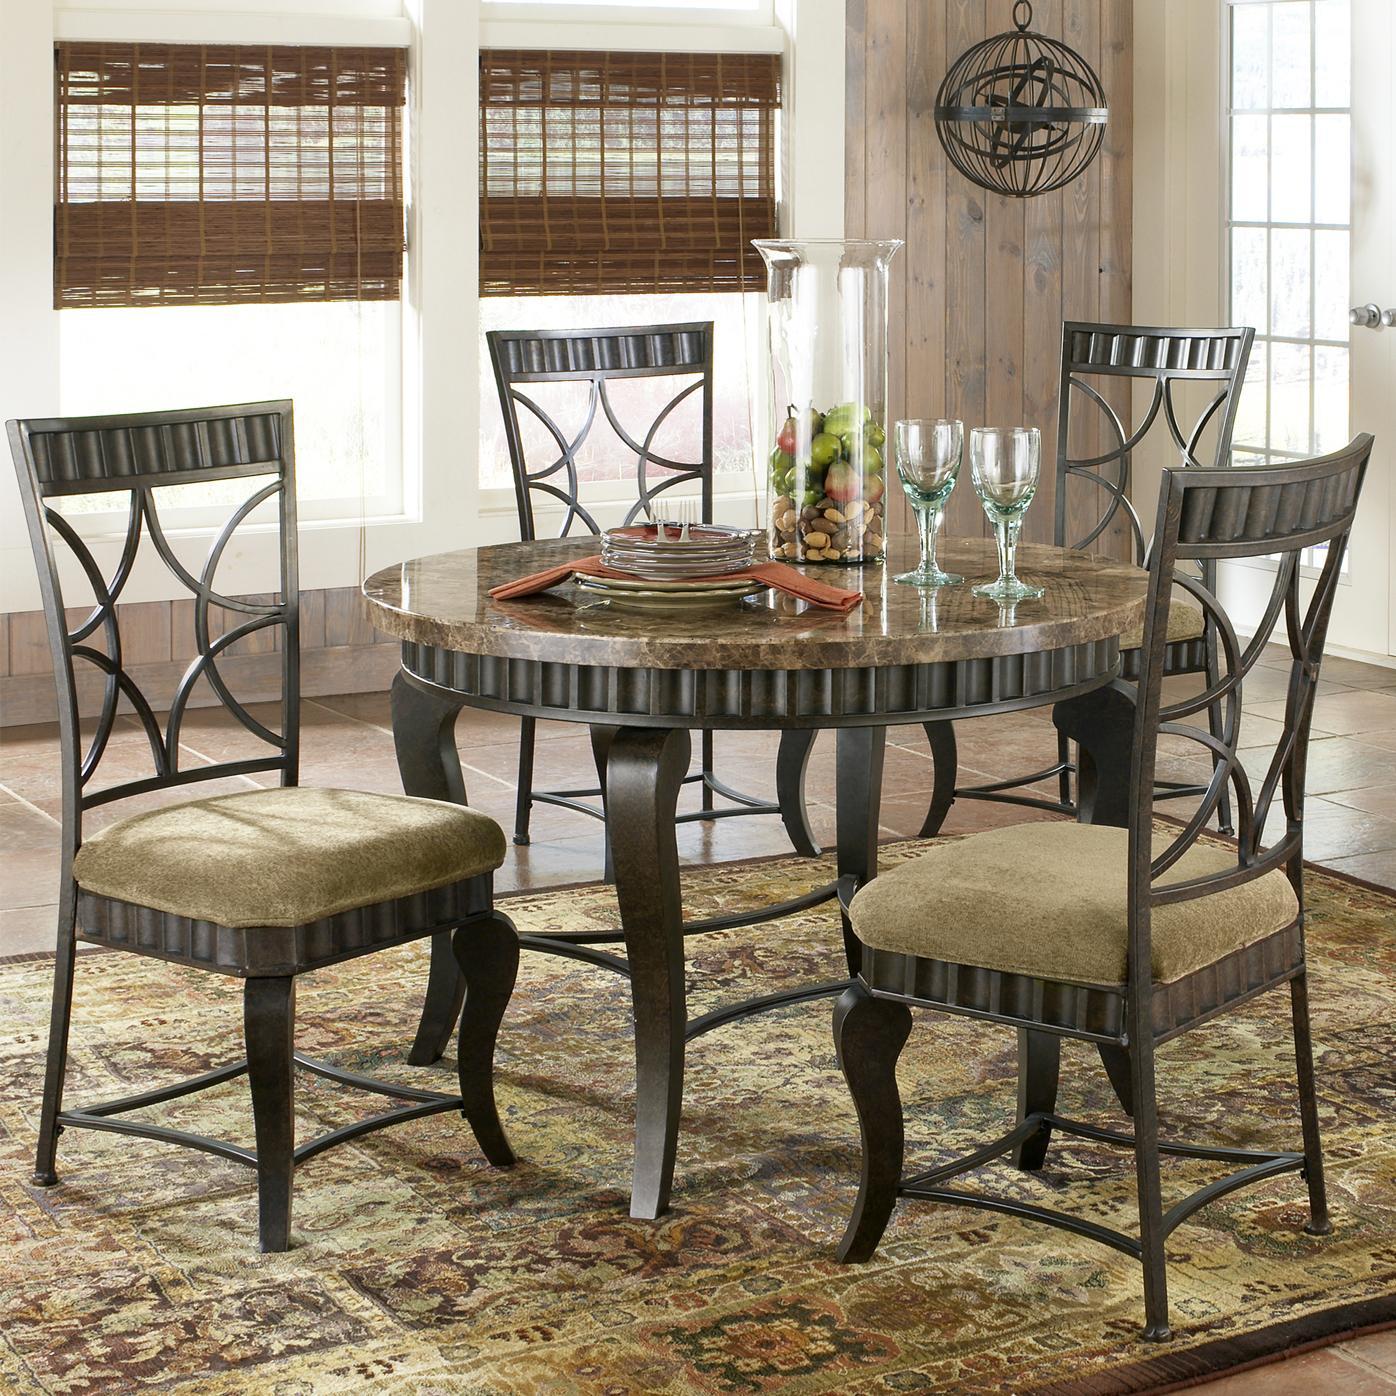 steve silver hamlyn 5 piece faux marble top dining table set rh northeastfactorydirect com